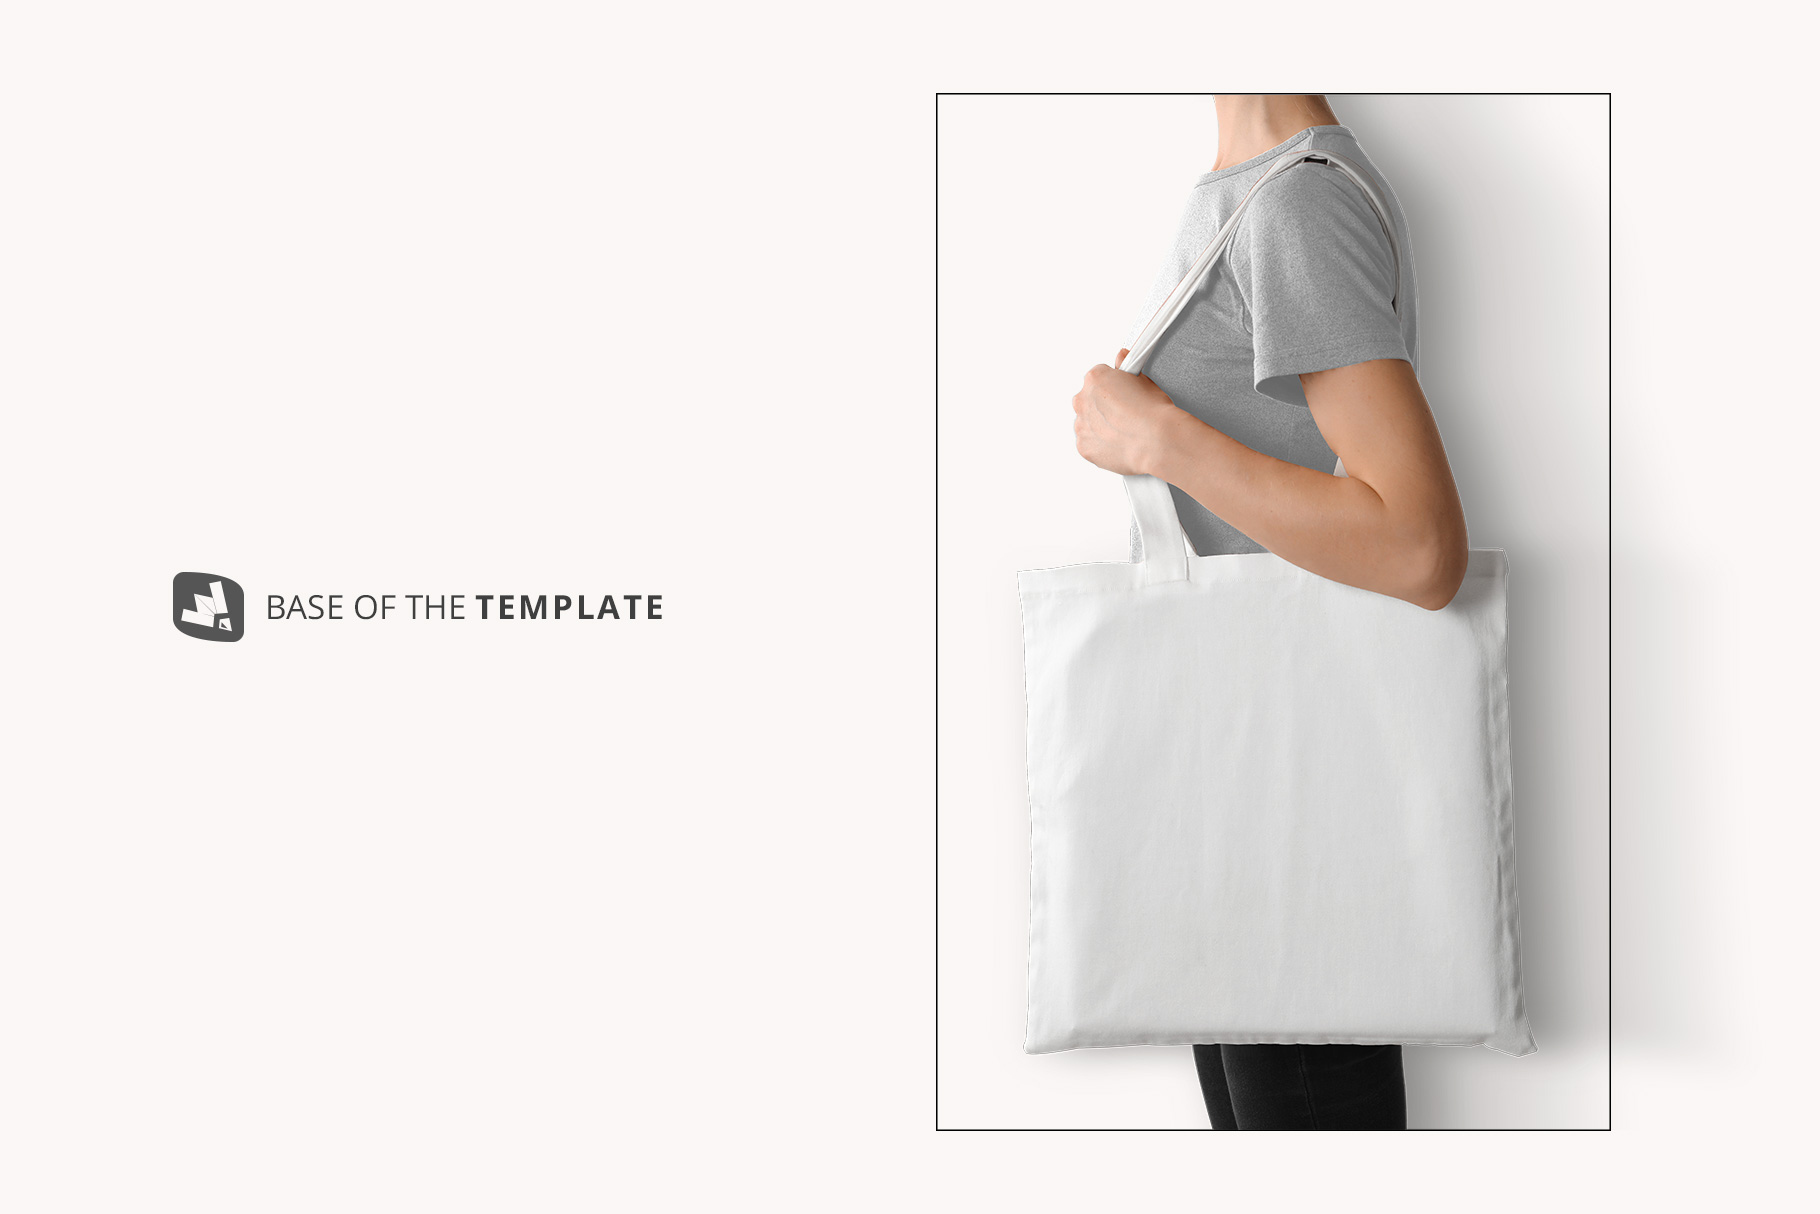 base image of the large cotton bag mockup with model